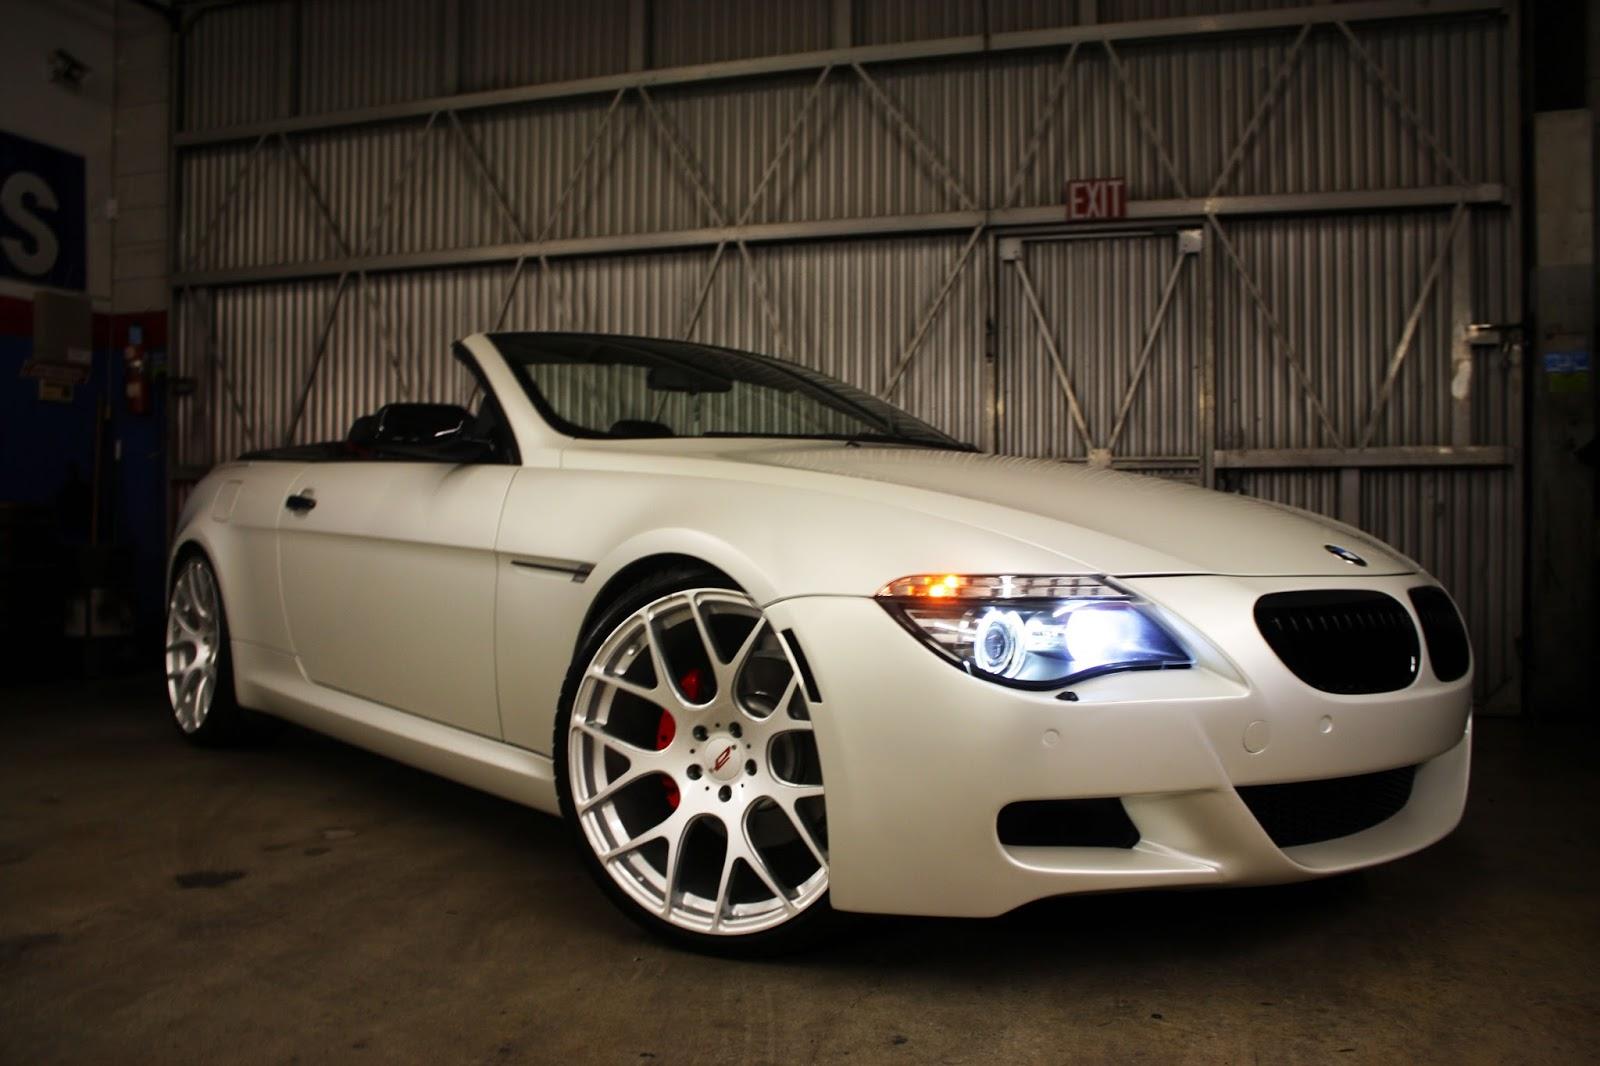 European vision autoworks satin pearl white bmw 650i custom exhaust publicscrutiny Images